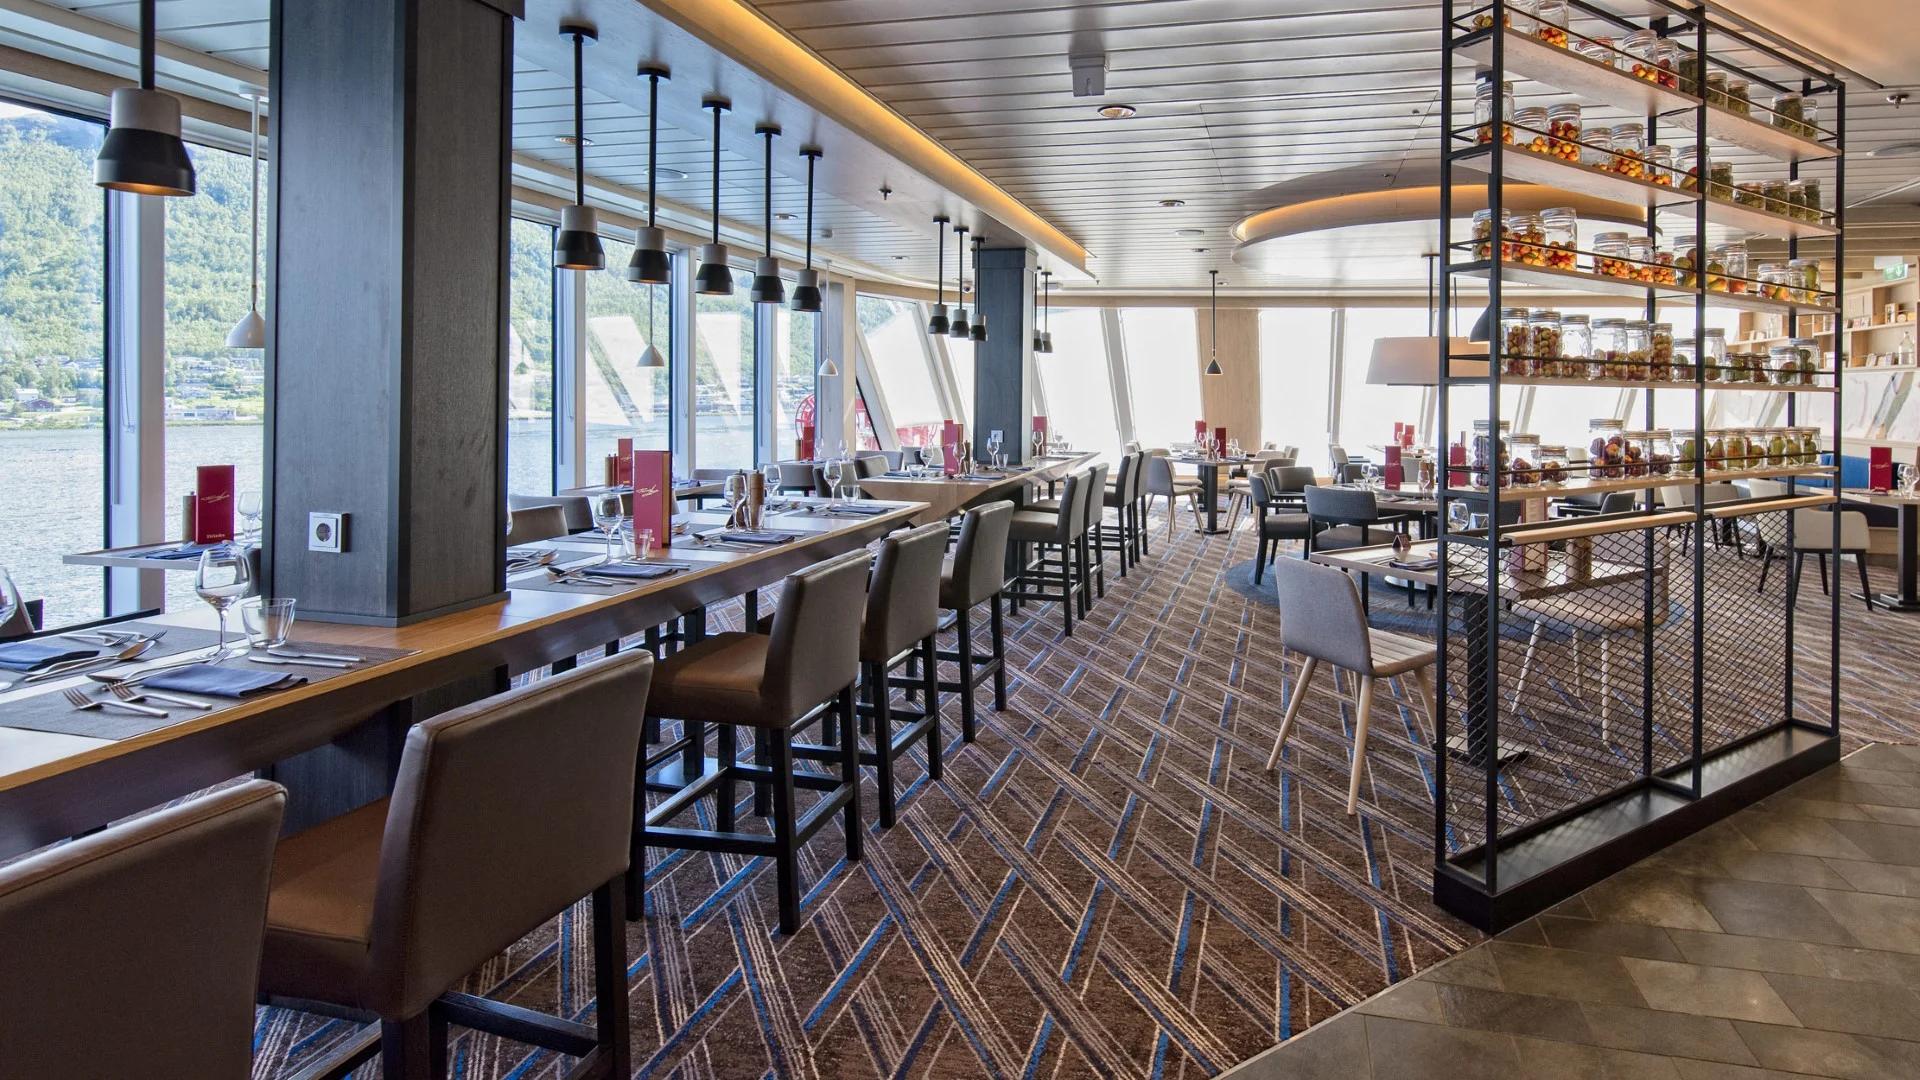 MS Roald Amundsen Aune Restaurant